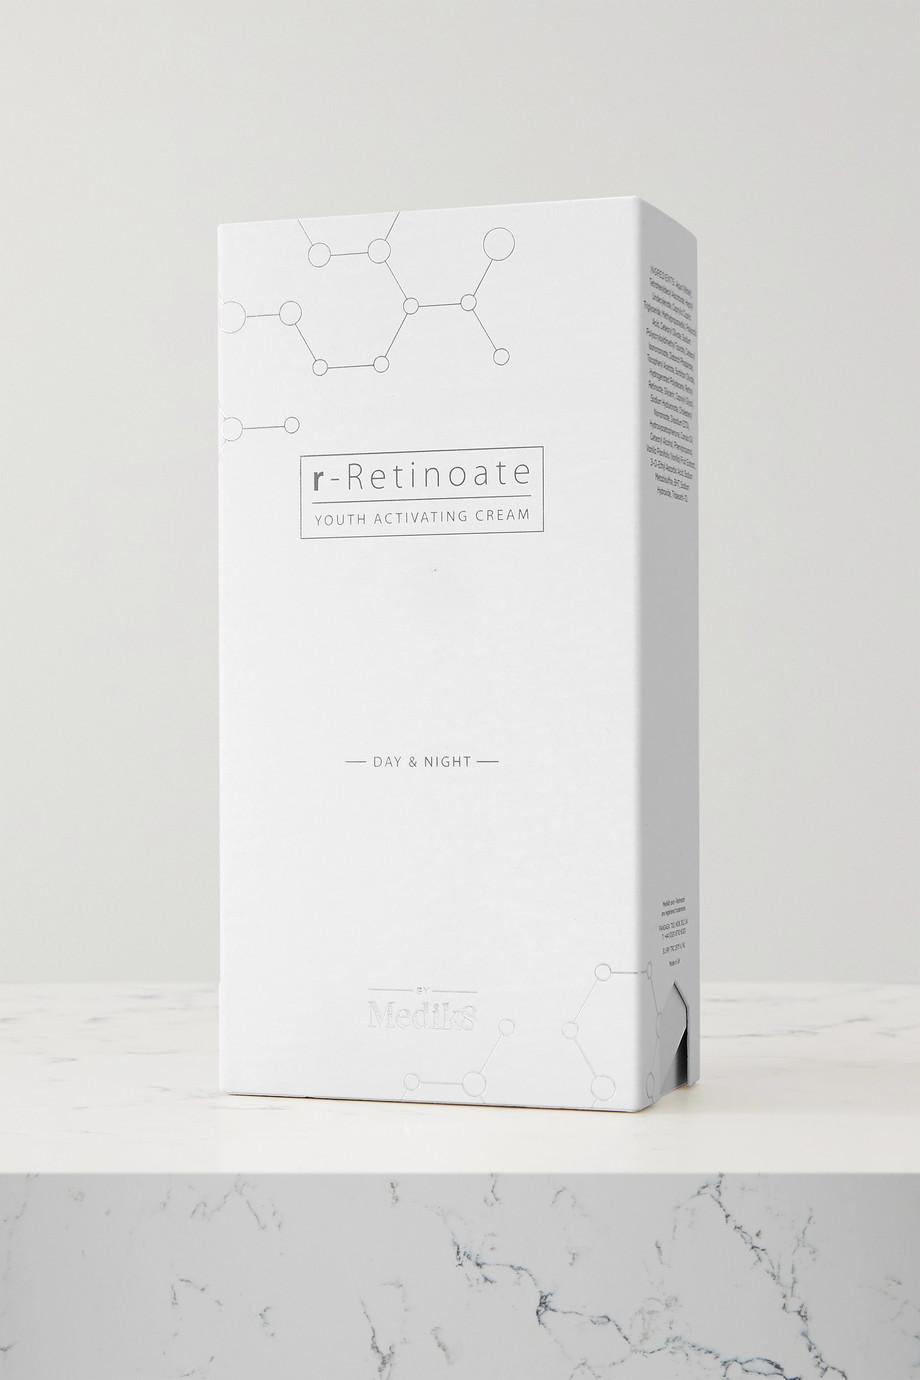 Medik8 r-Retinoate Day & Night cream, 50ml